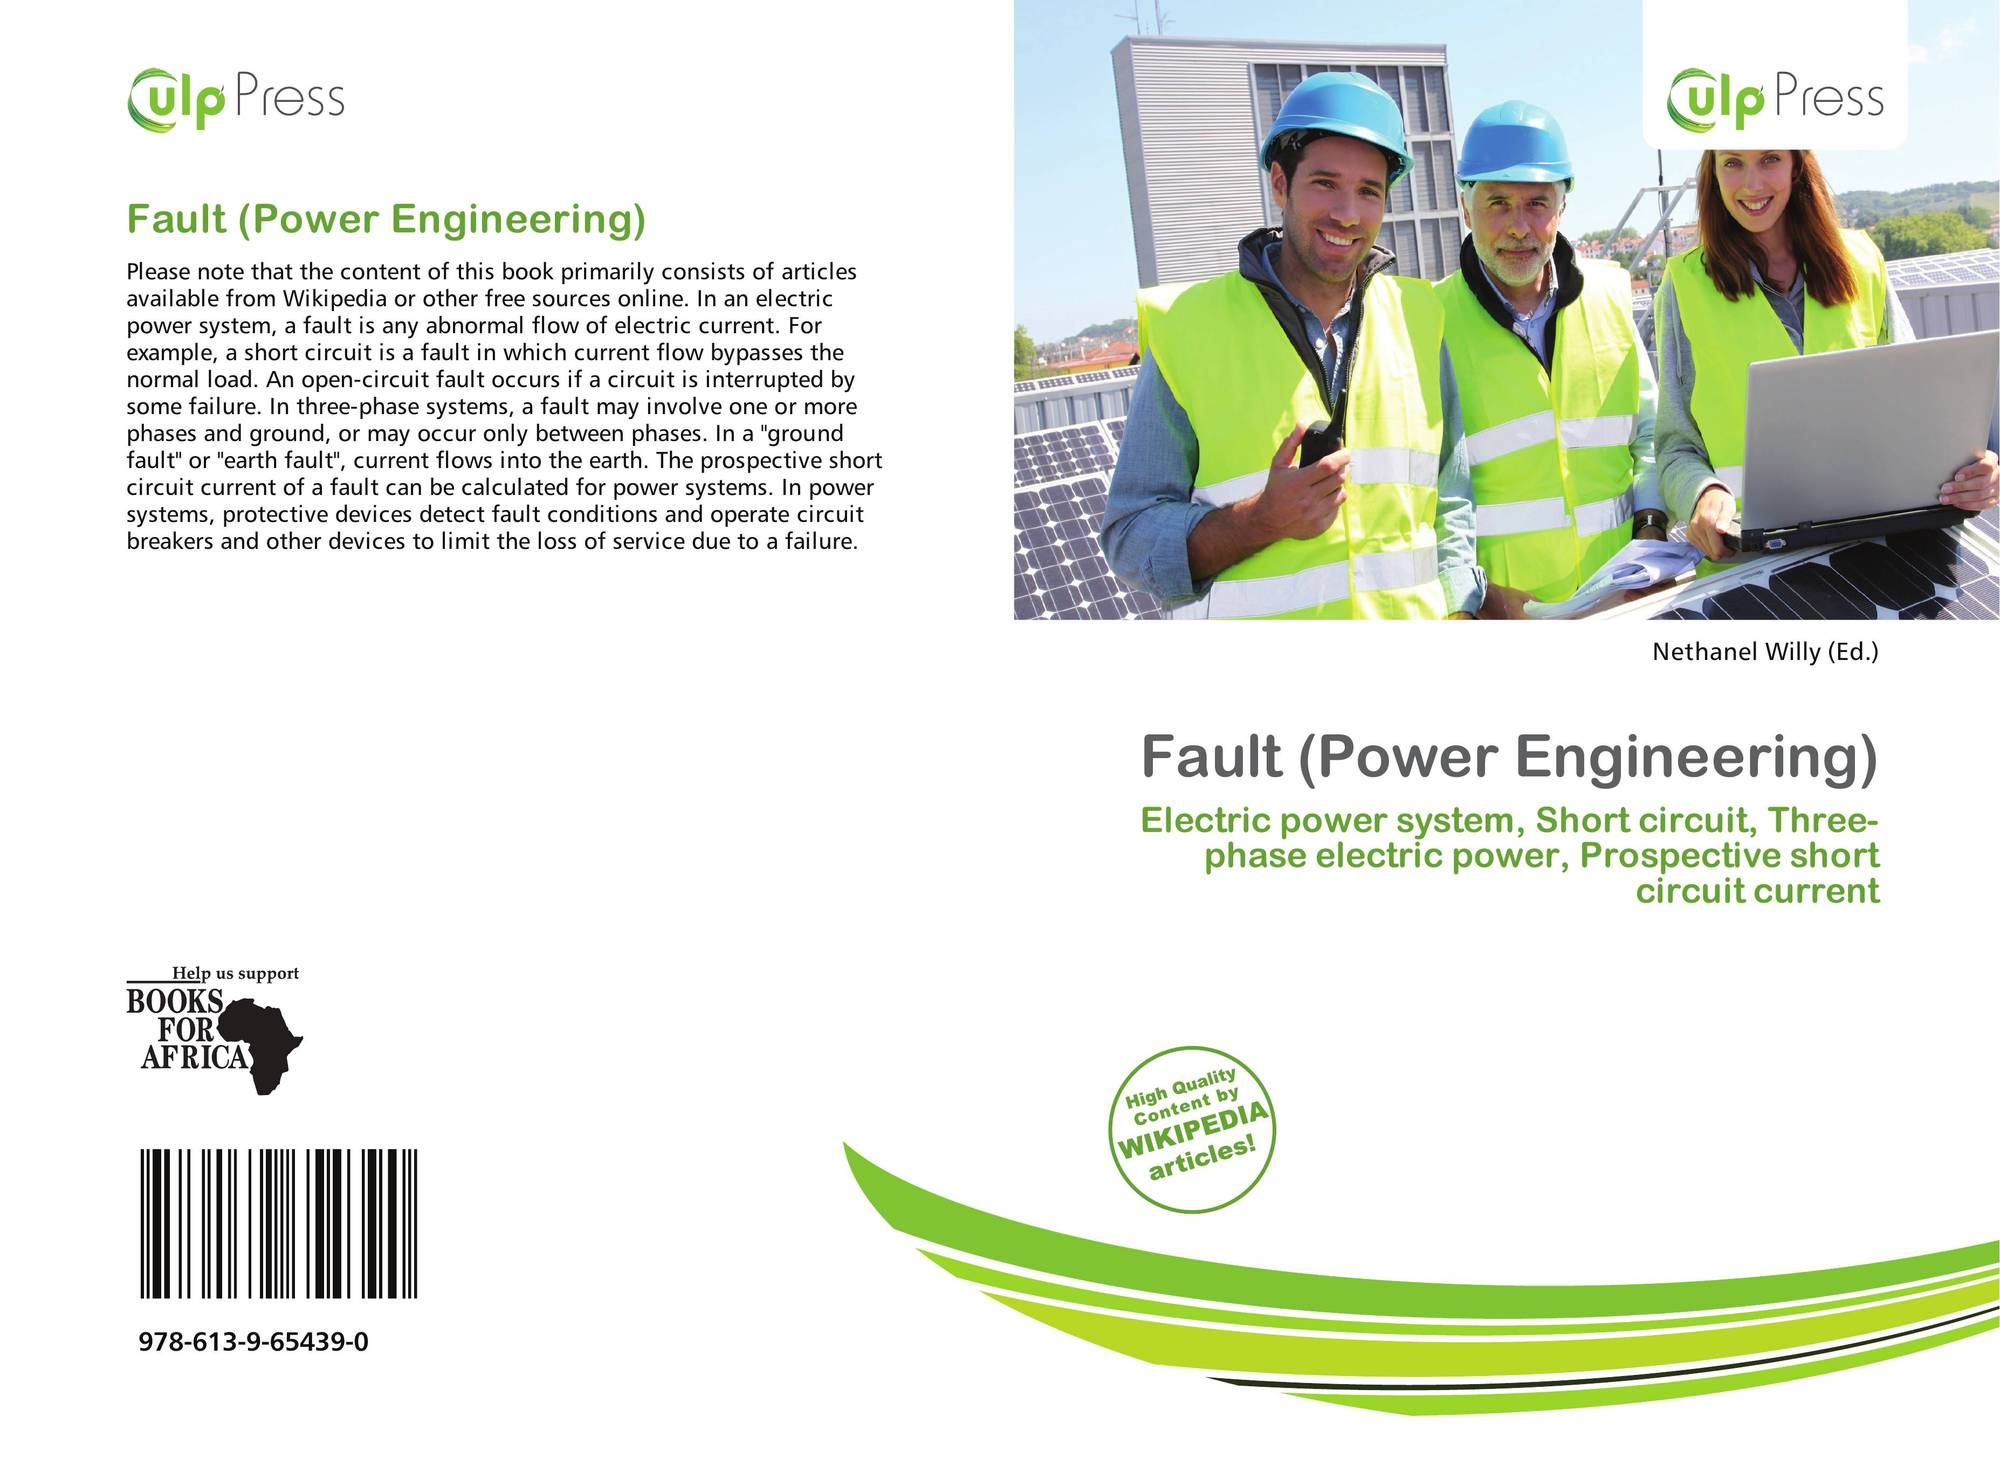 Fault (Power Engineering), 978-613-9-65439-0, 6139654394 ,9786139654390